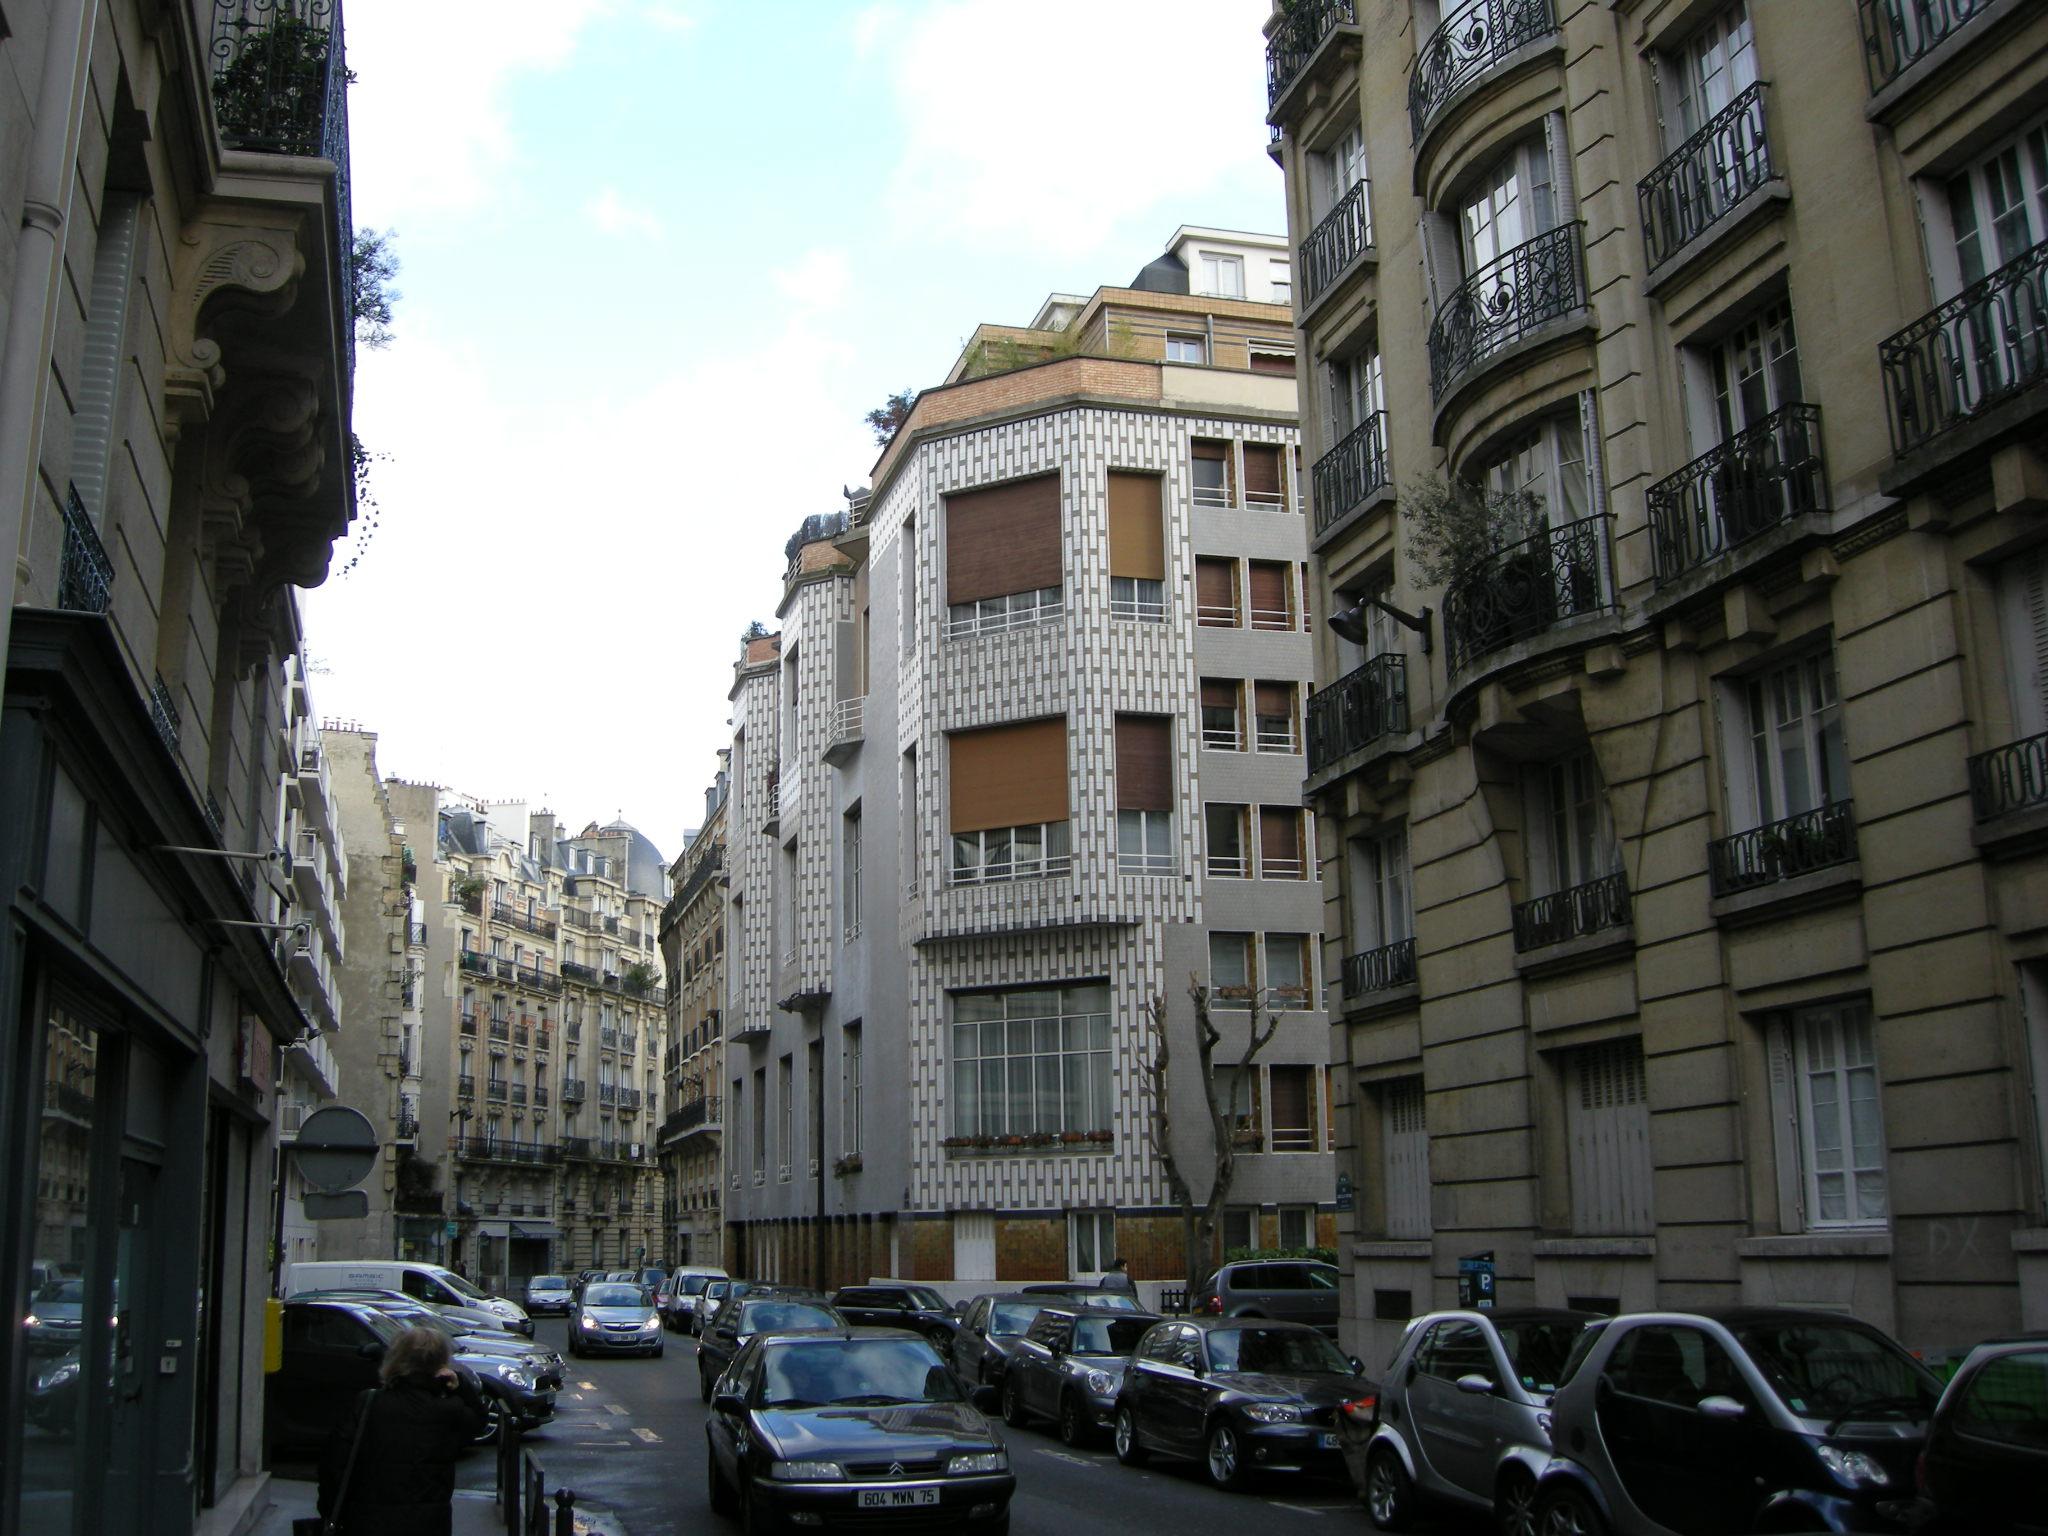 File auteuil rue la fontaine 65 complesso di studi di artisti henri sauvage jpg wikimedia - Porte de saint cloud restaurant ...